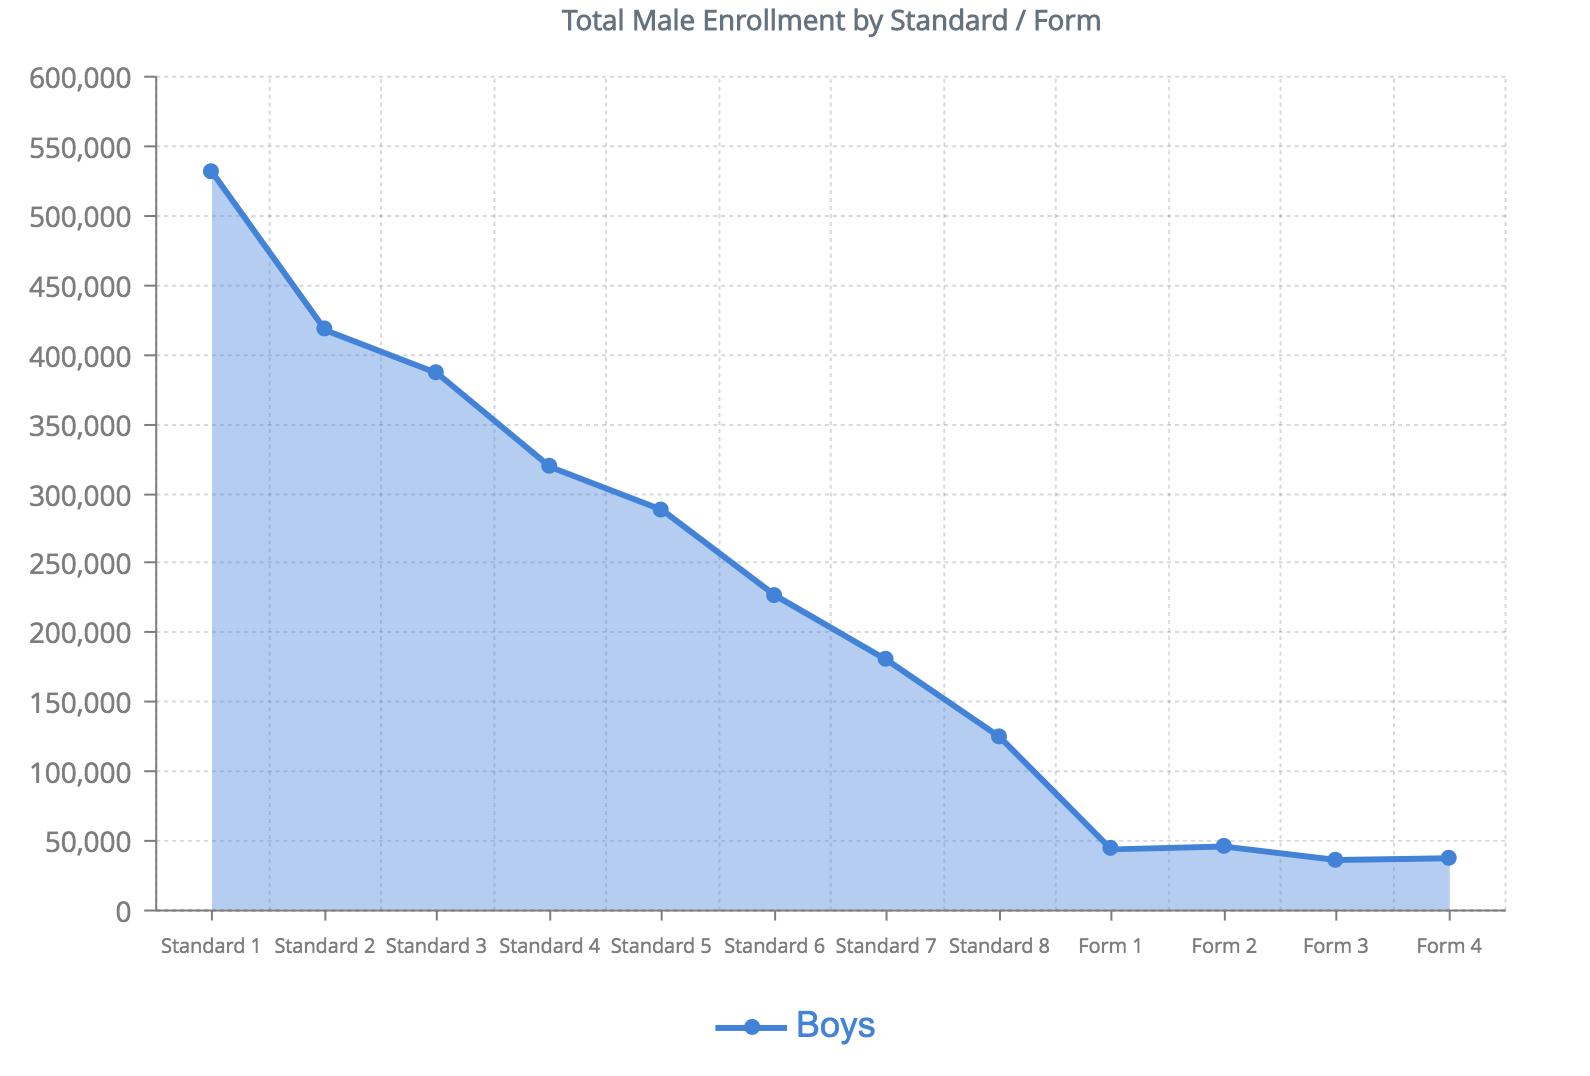 Total Male Enrollment by Standard / Form